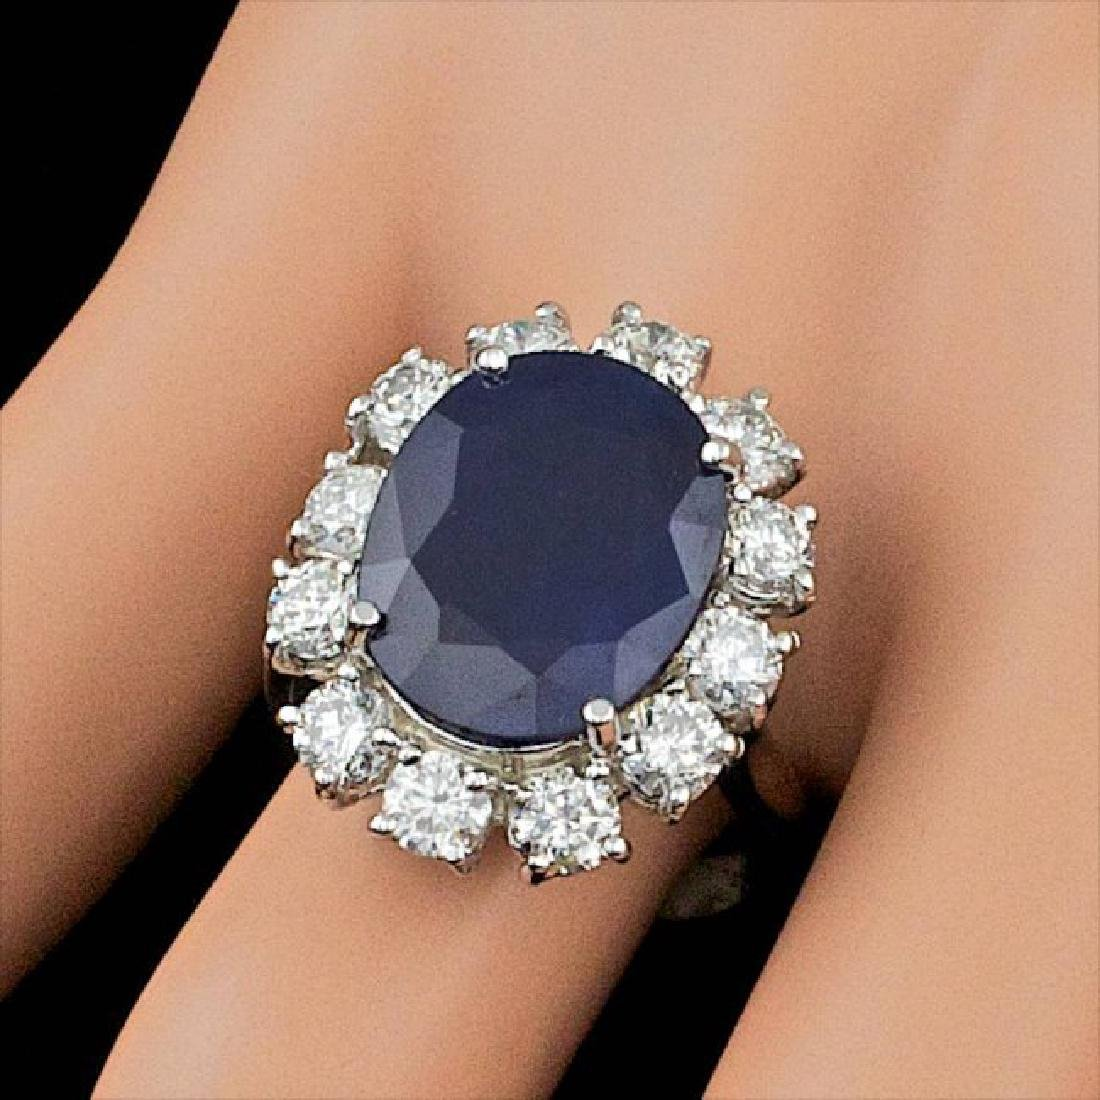 14k Gold 8.50ct Sapphire 2.30ct Diamond Ring - 4